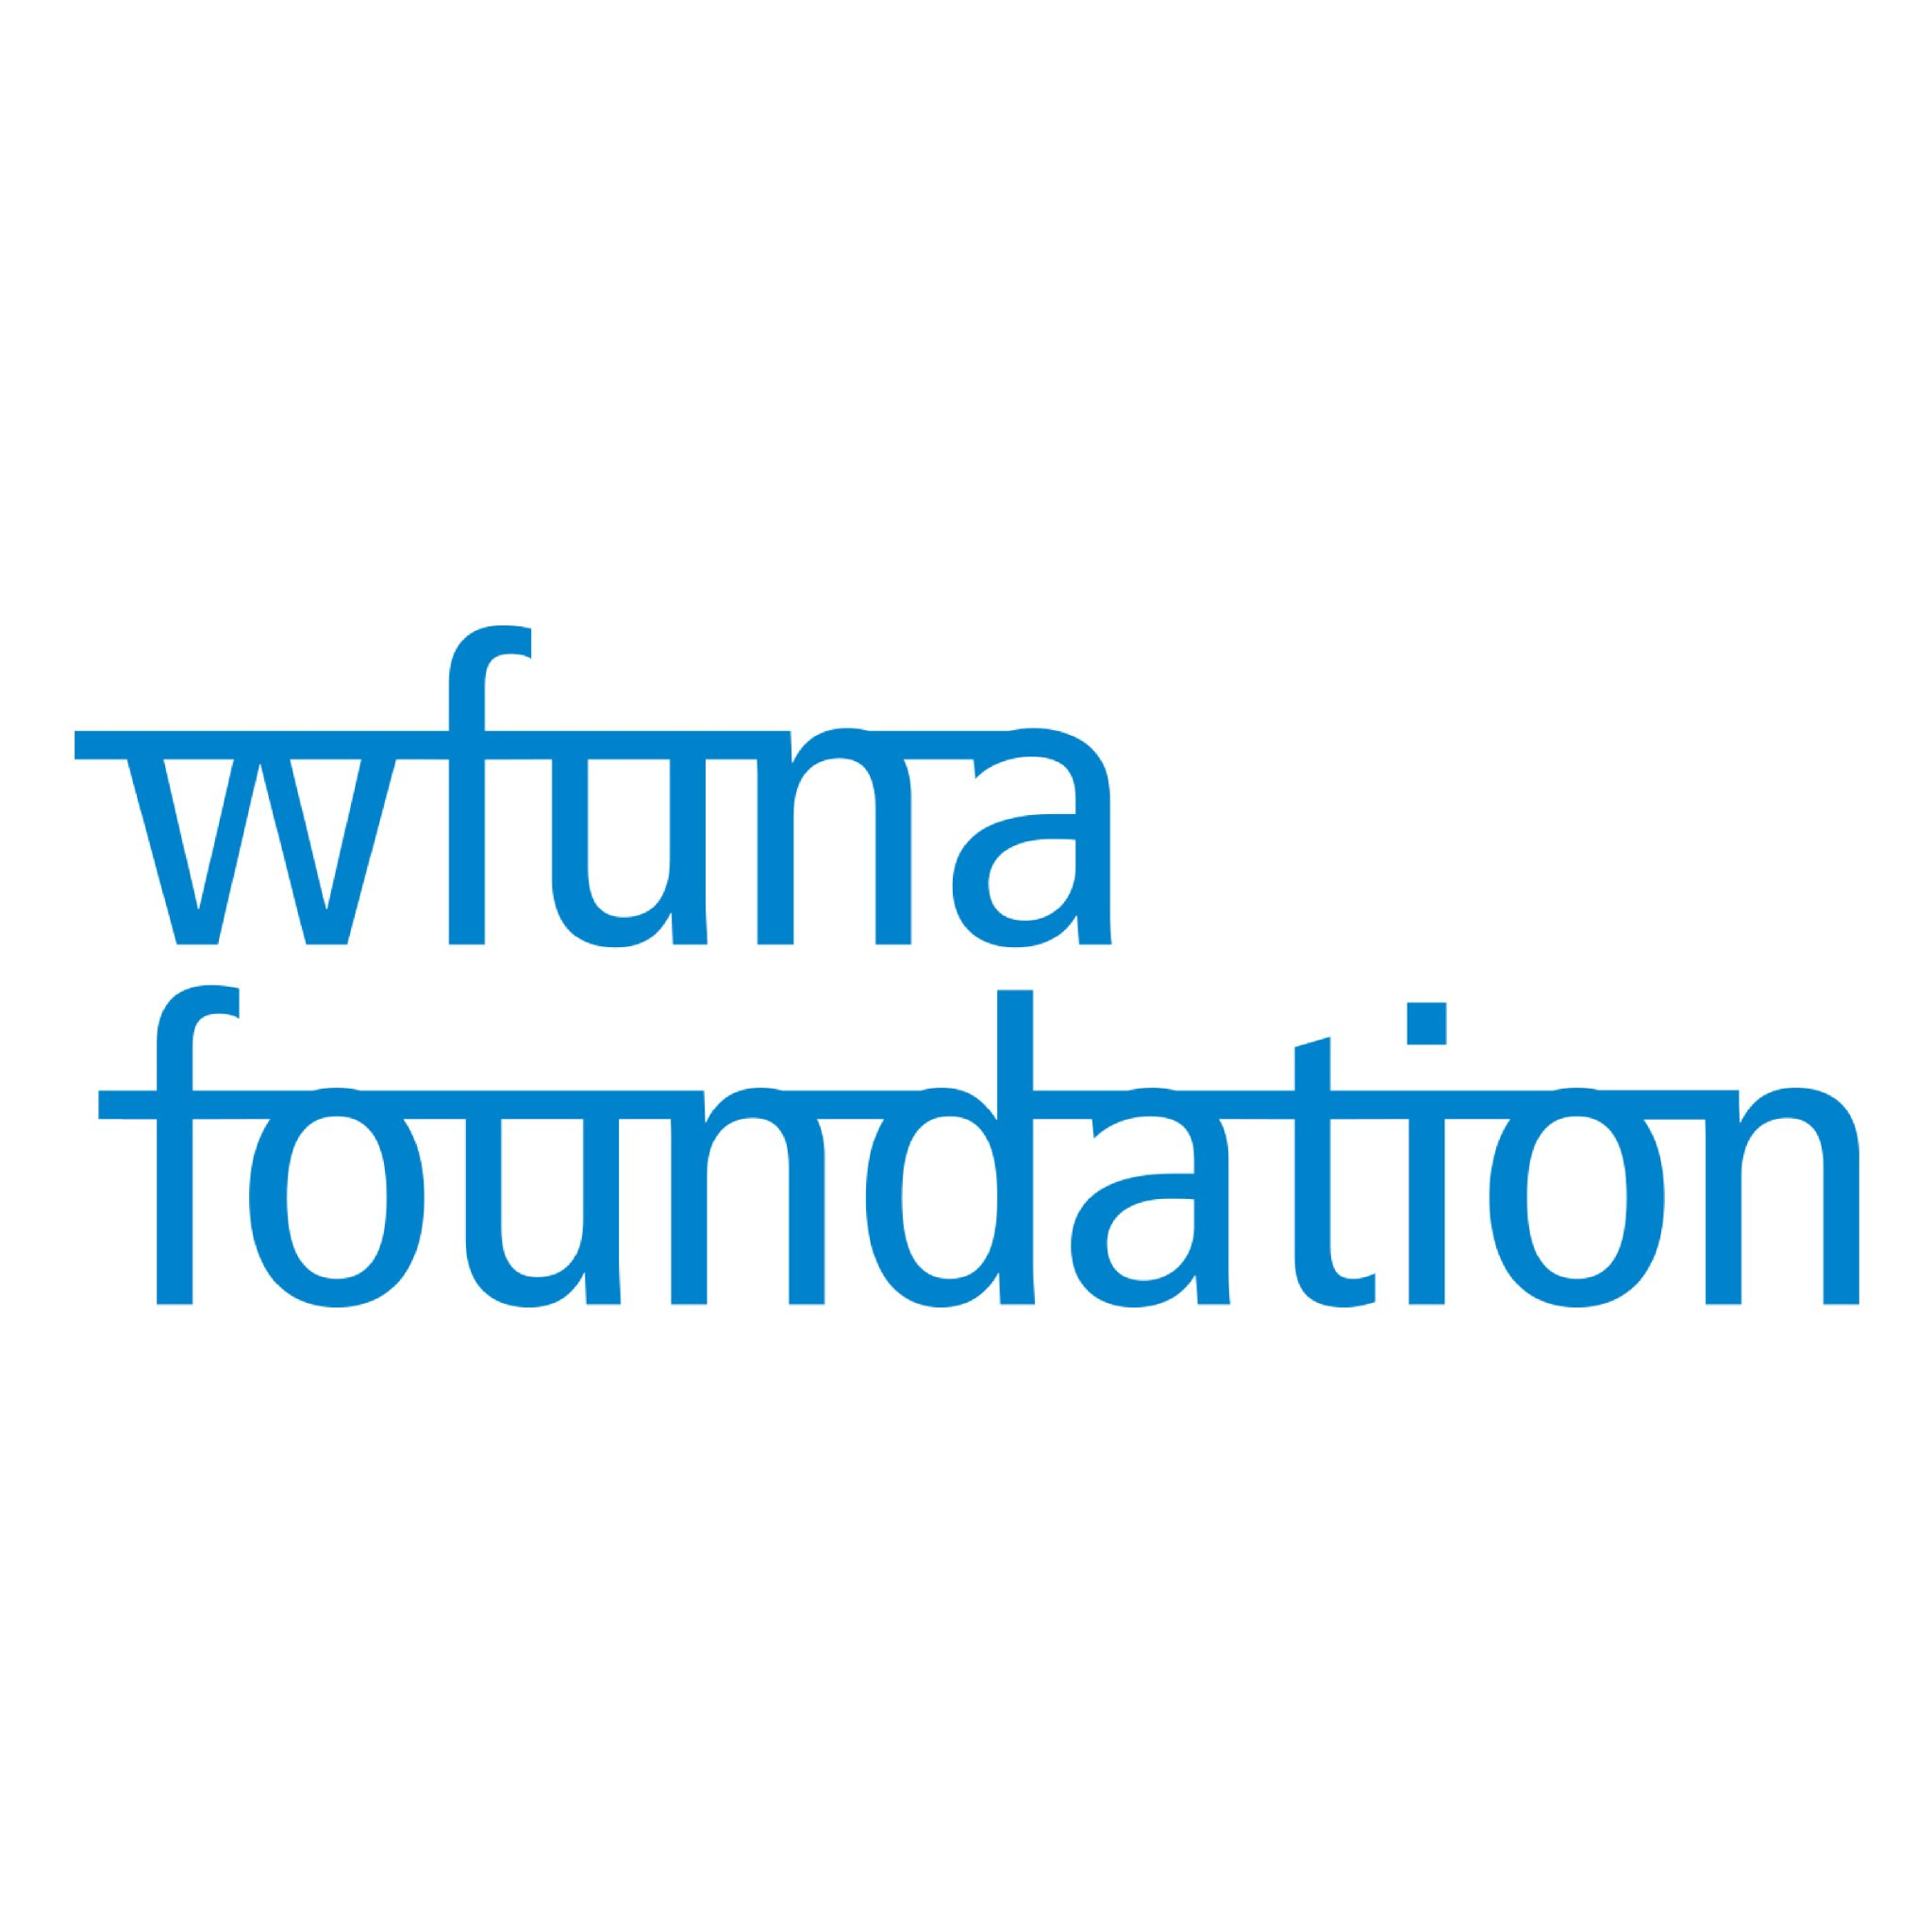 WFUNA Foundation